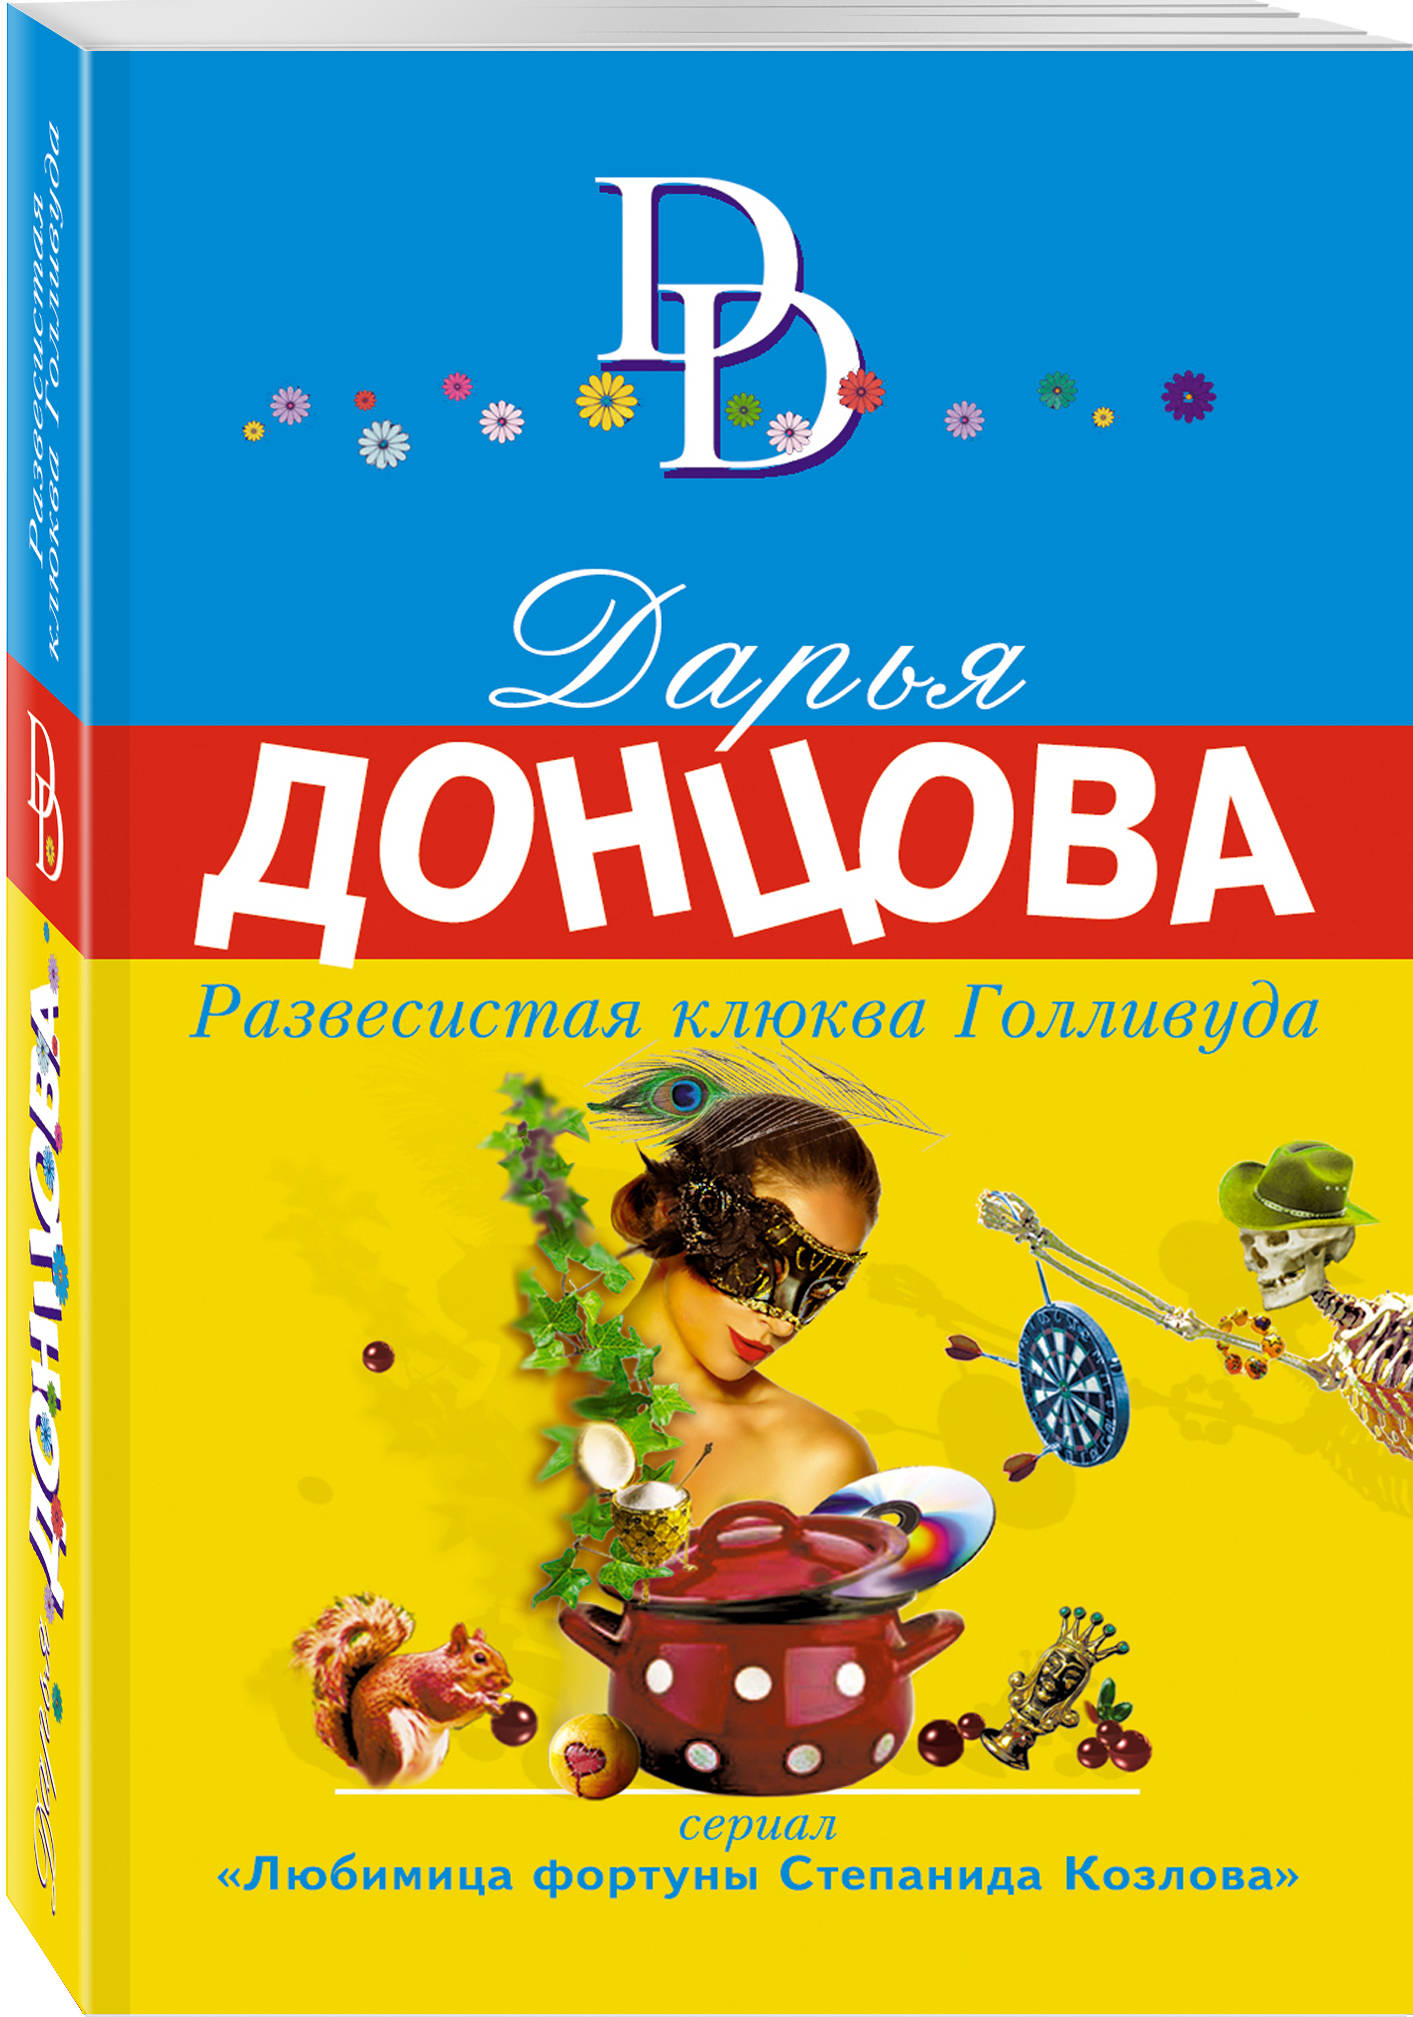 Донцова Дарья Аркадьевна Развесистая клюква Голливуда